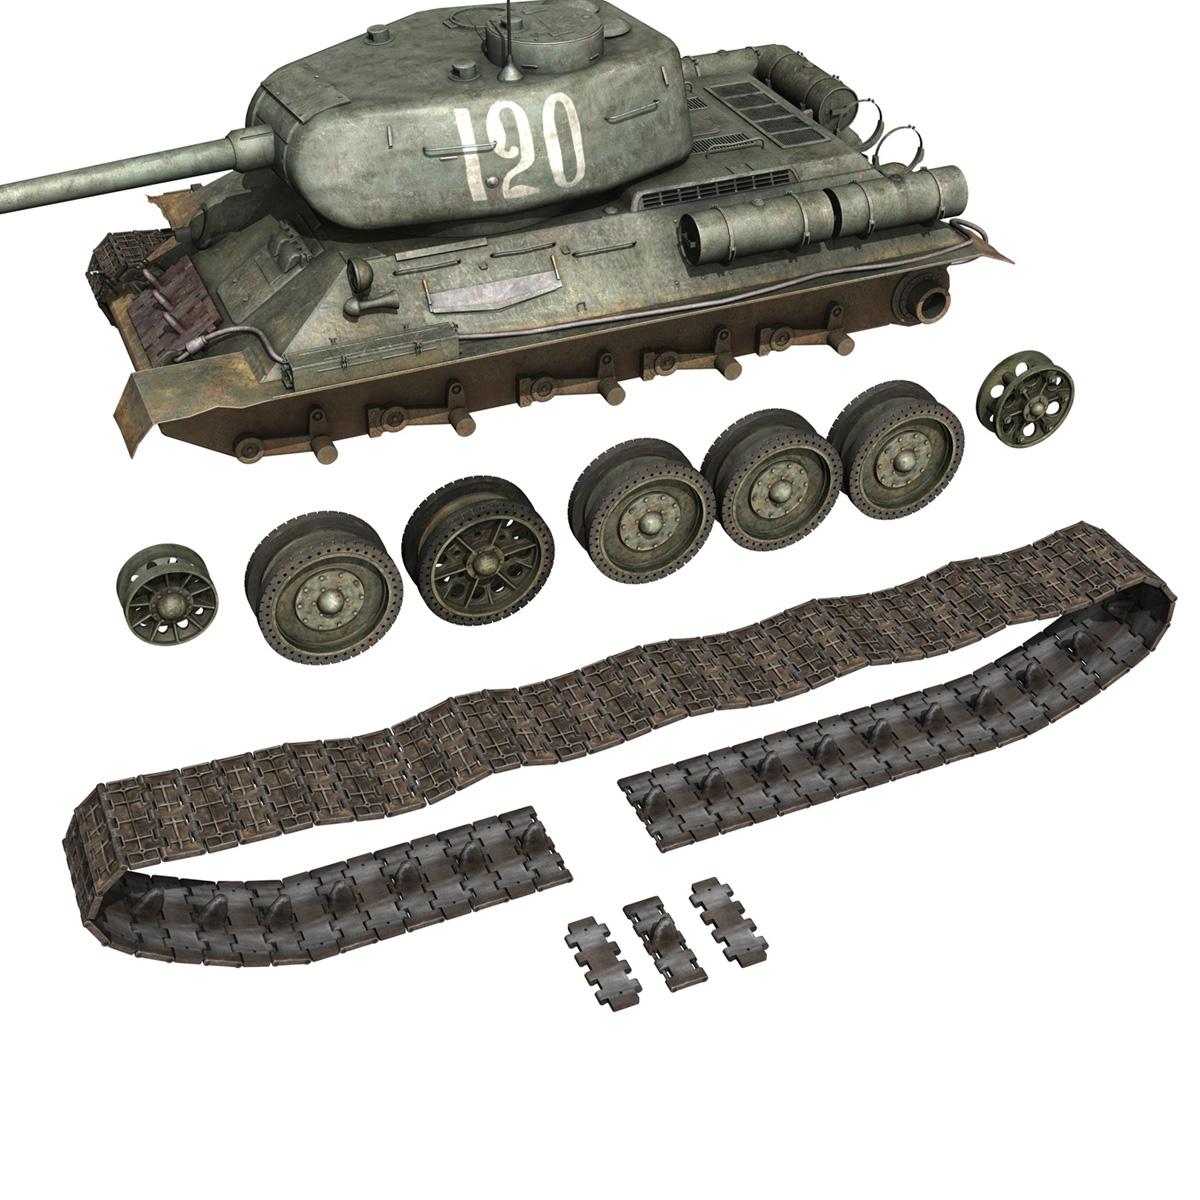 t-34 85 – soviet medium tank – 120 3d model 3ds fbx lwo lw lws obj c4d 265377